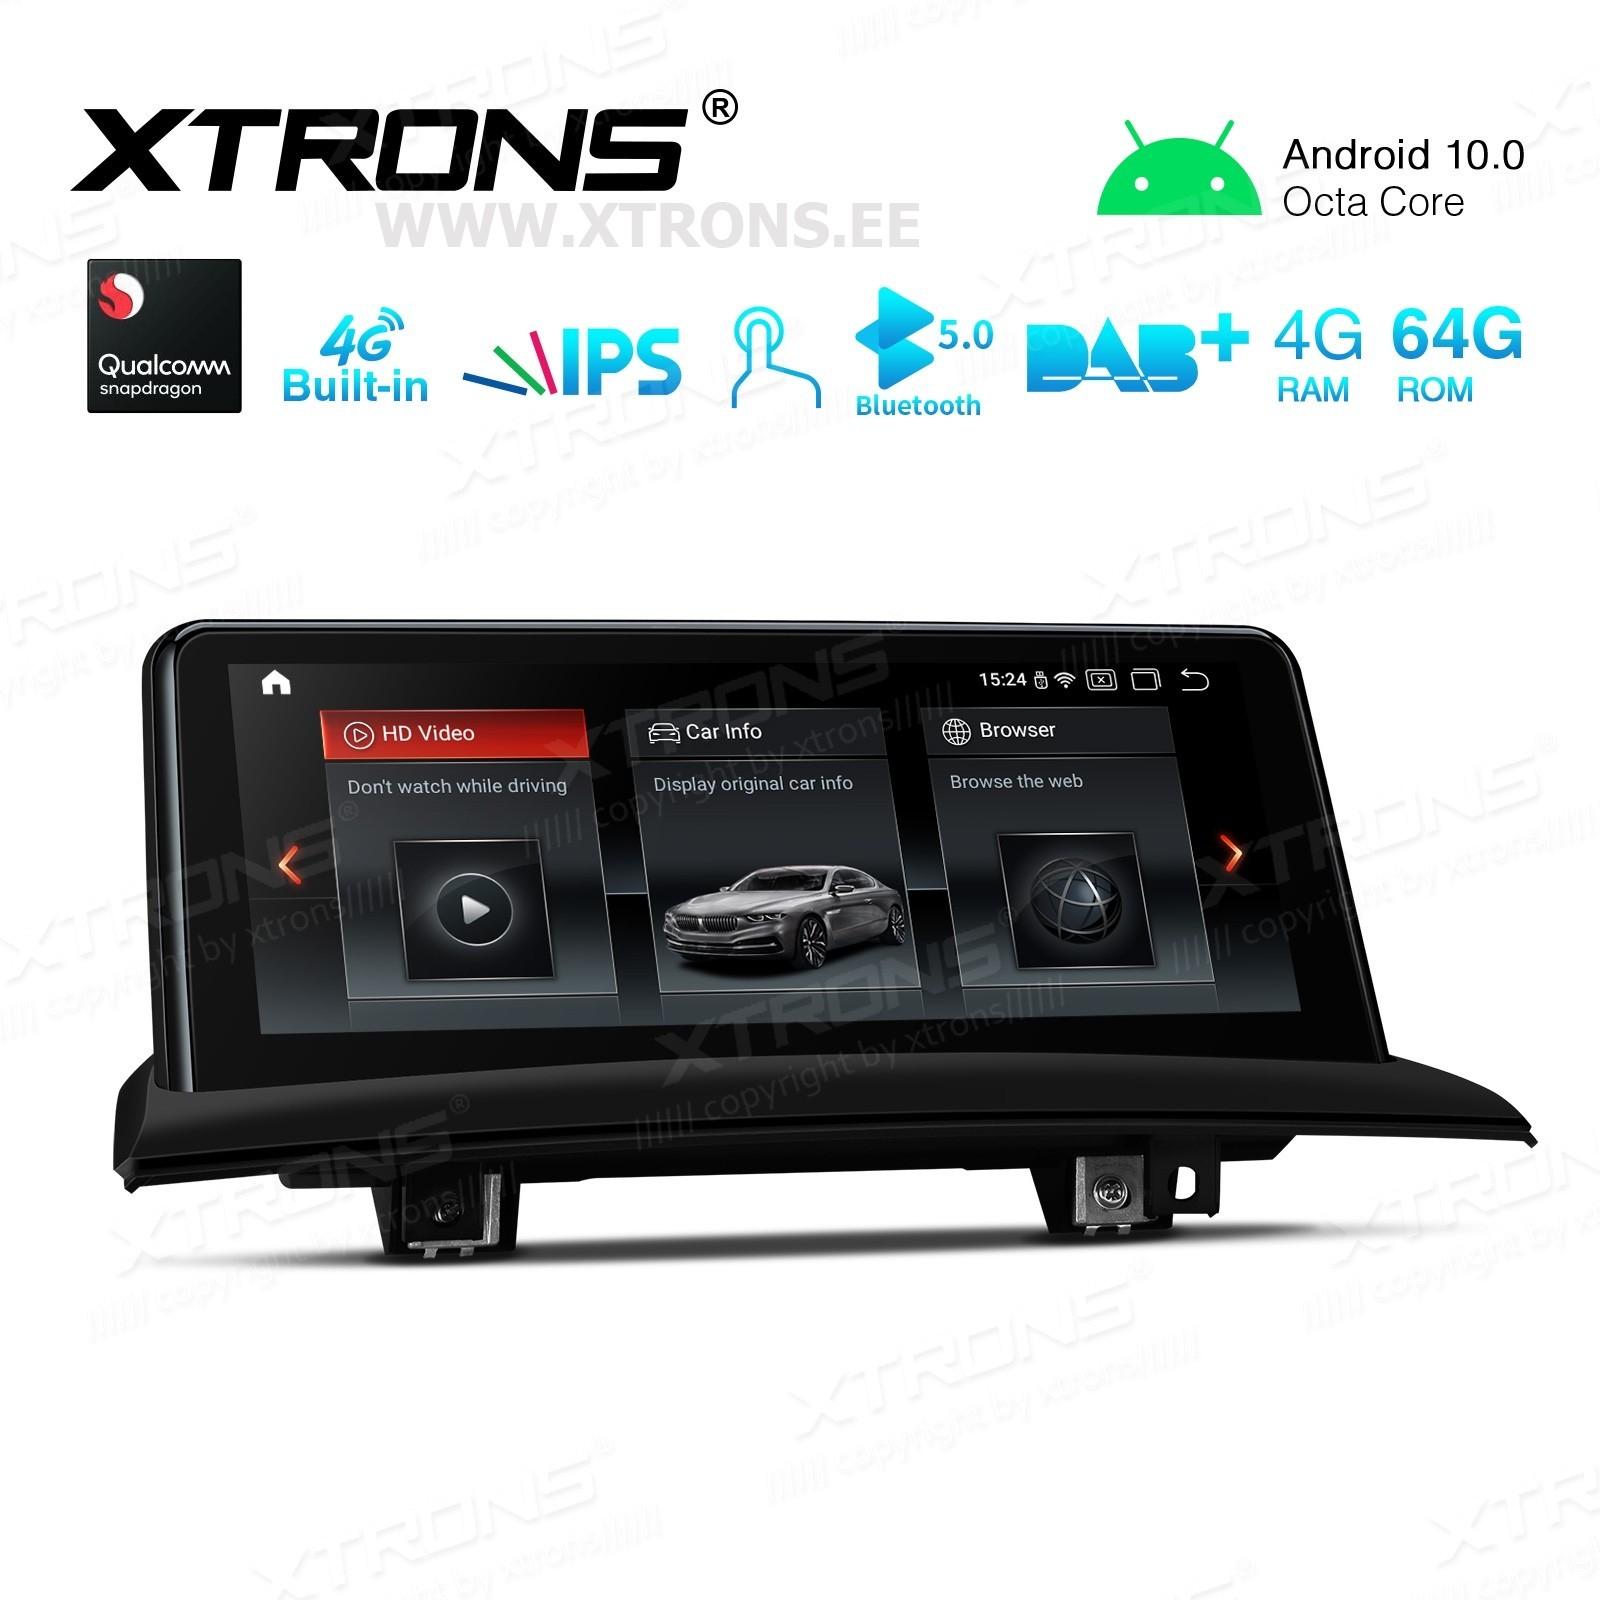 XTRONS QB10X3UN